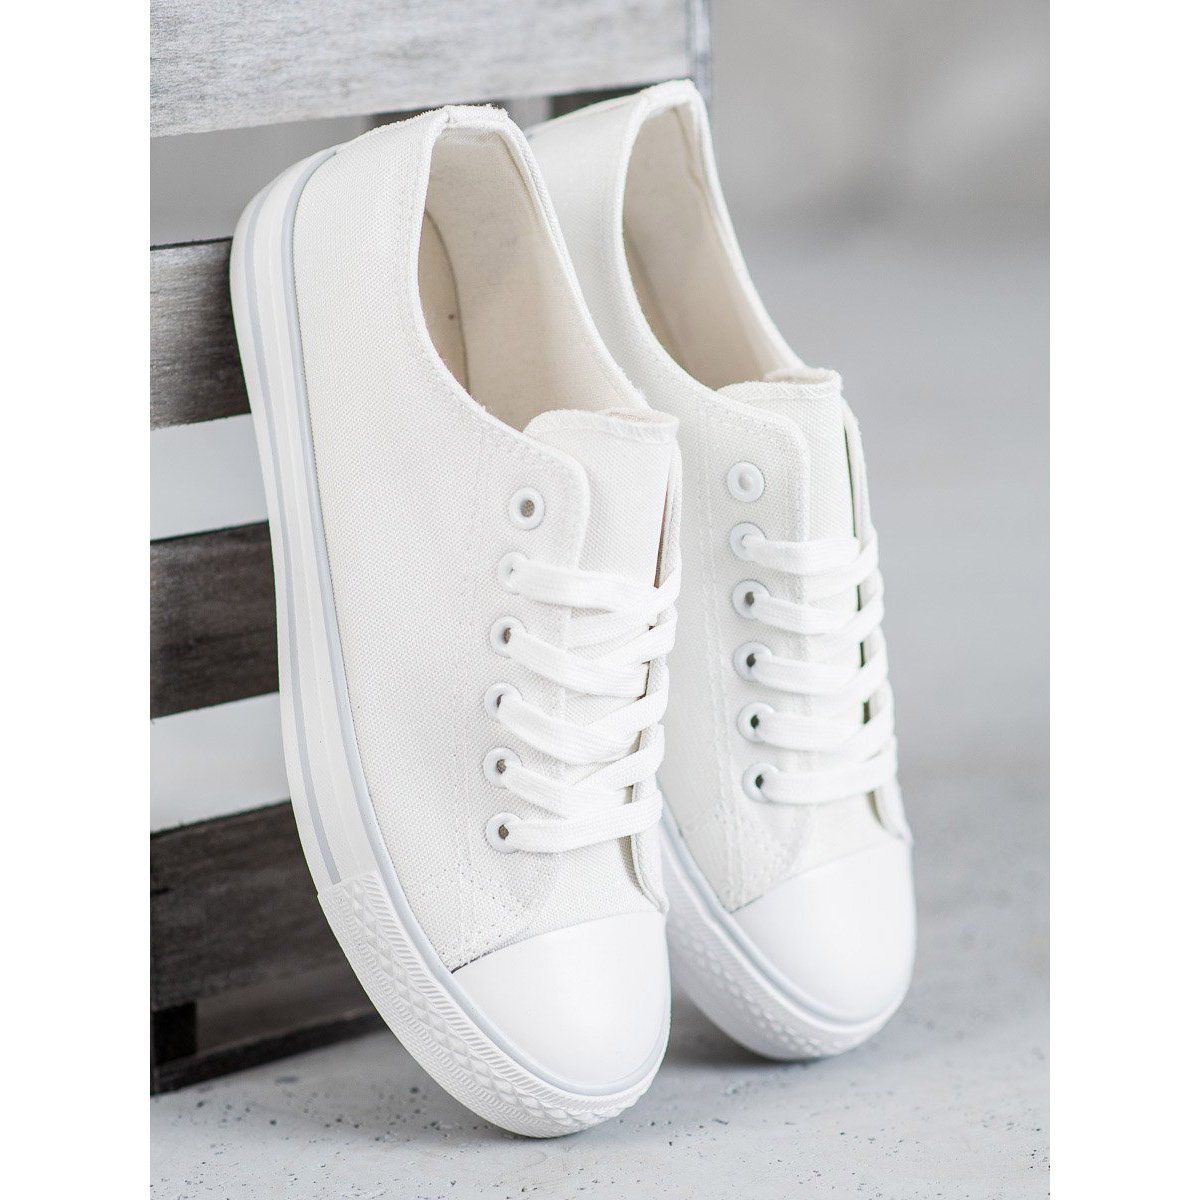 Shelovet Biale Trampki White Sneakers Sneakers Trainers Women